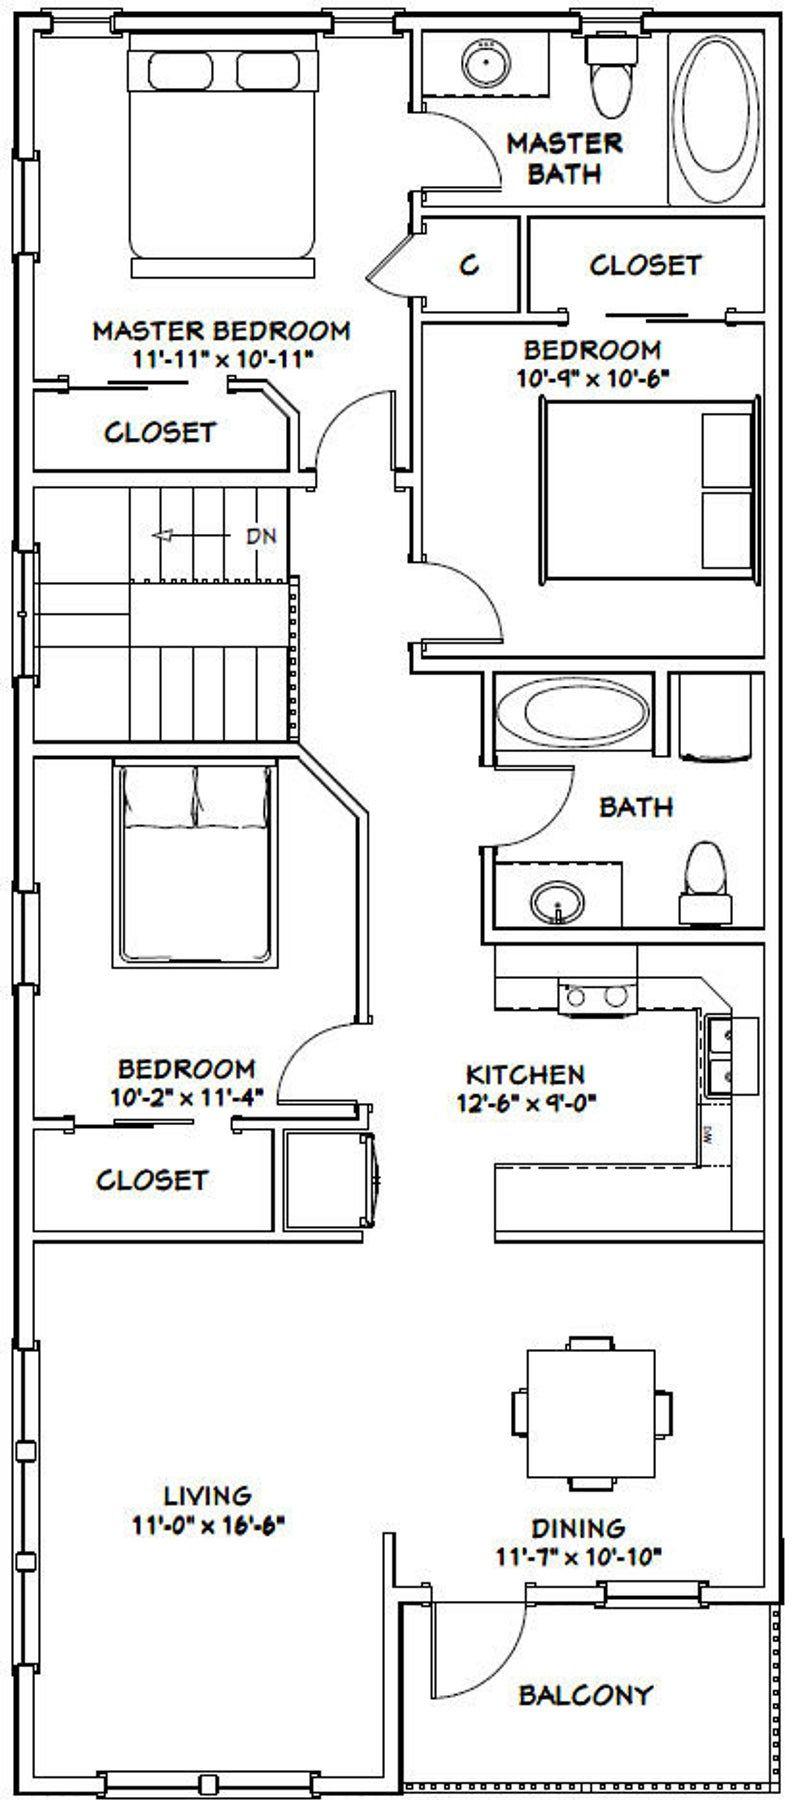 60x50 House 3 Bedroom 2 5 Bath 1703 Sq Ft Pdf Floor Etsy In 2020 Bedroom Floor Plans Floor Plans House Plans